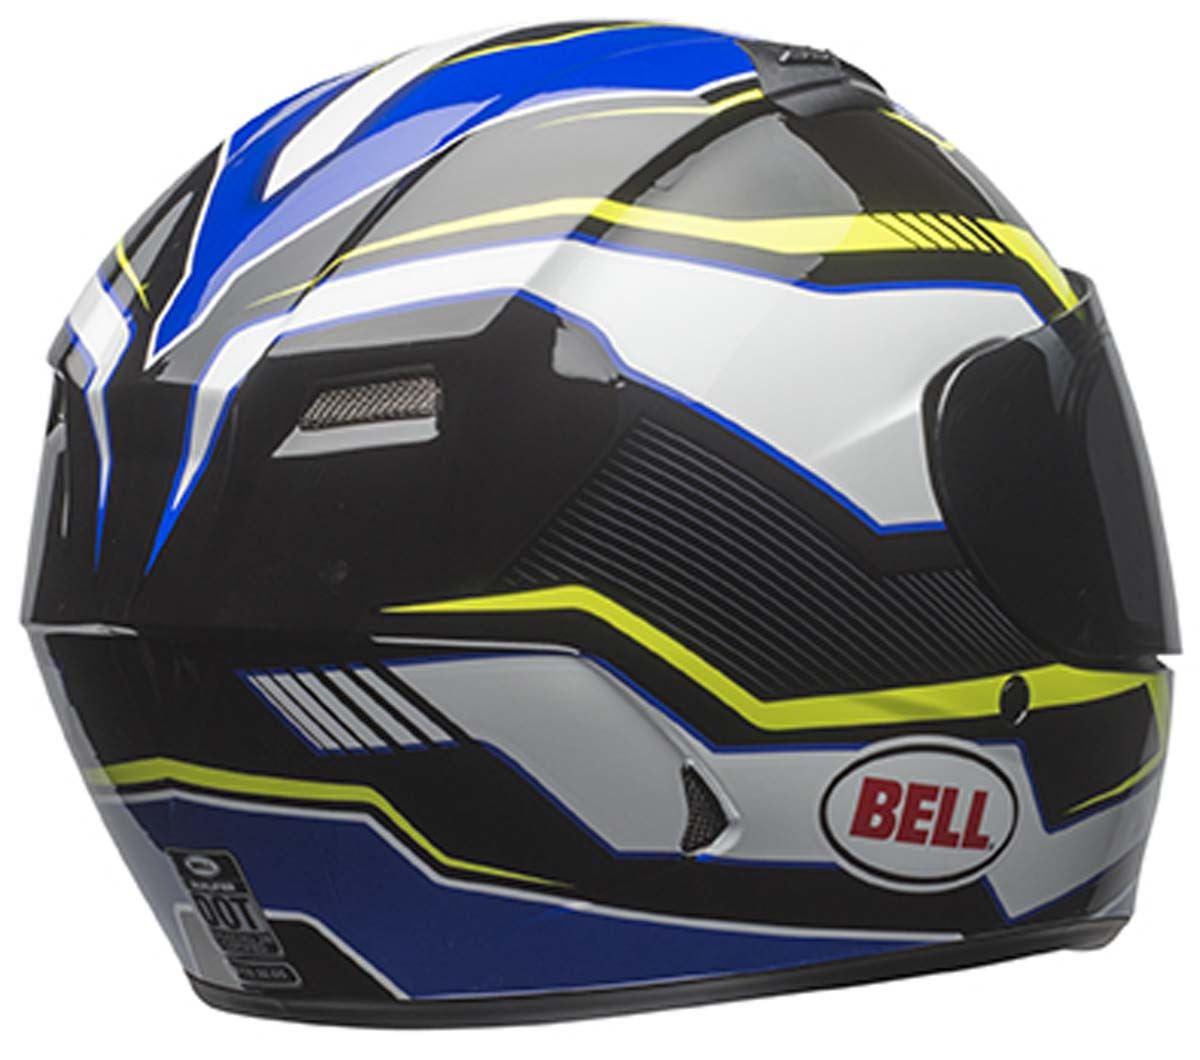 Bell-Qualifier-Helmet-Full-Face-Motorcycle-Clear-Shield-DOT-XS-3XL miniature 26